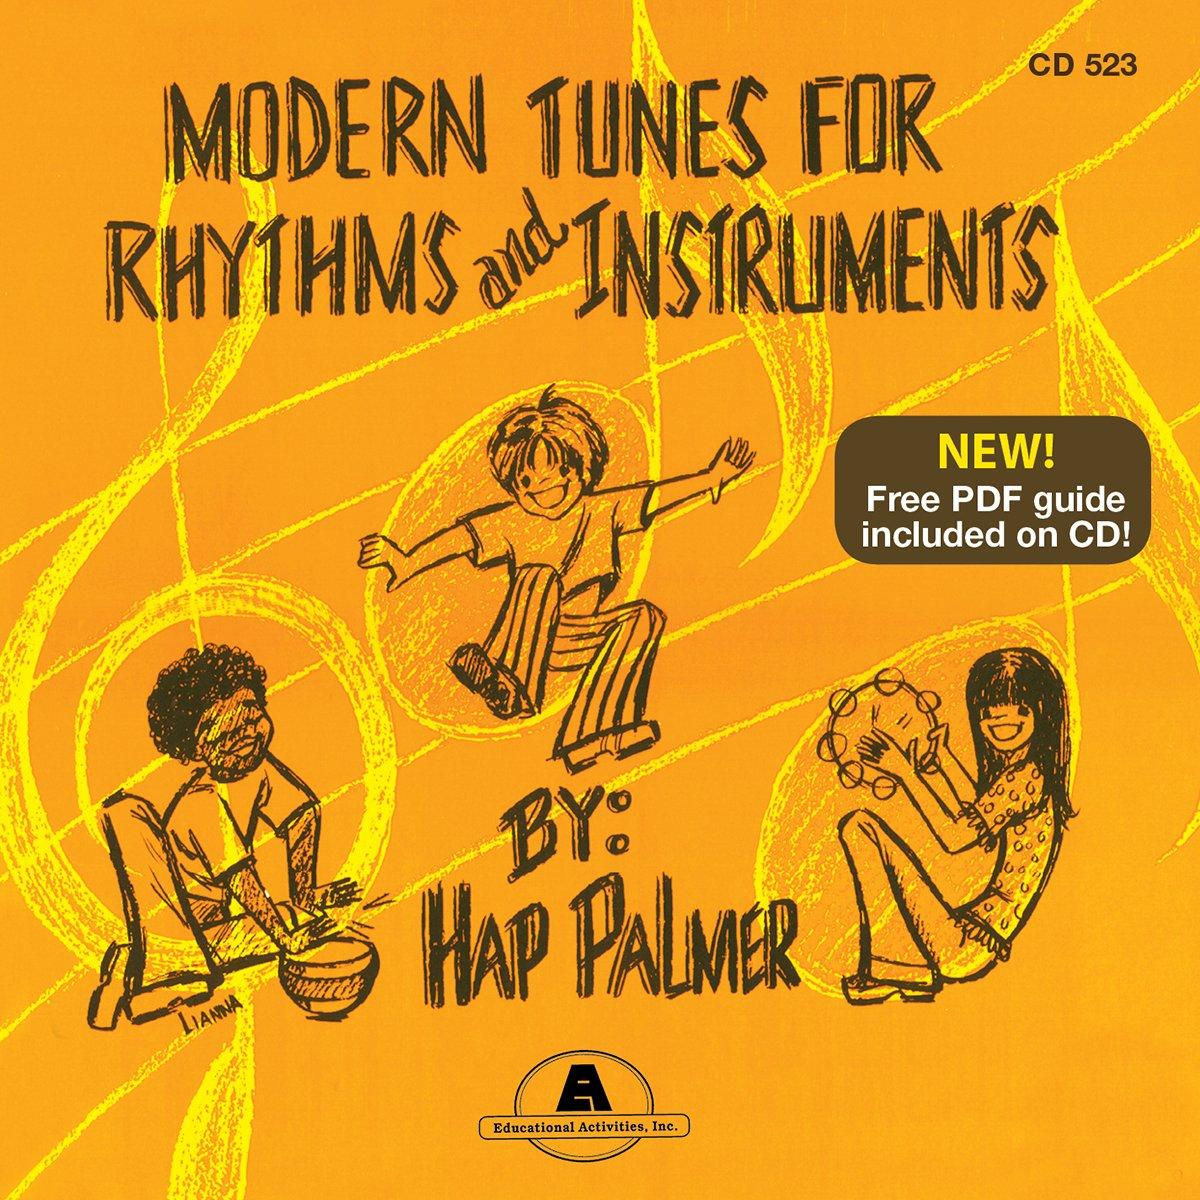 Modern Max Virginia Beach Mall 54% OFF Tunes for Instruments Rhythms